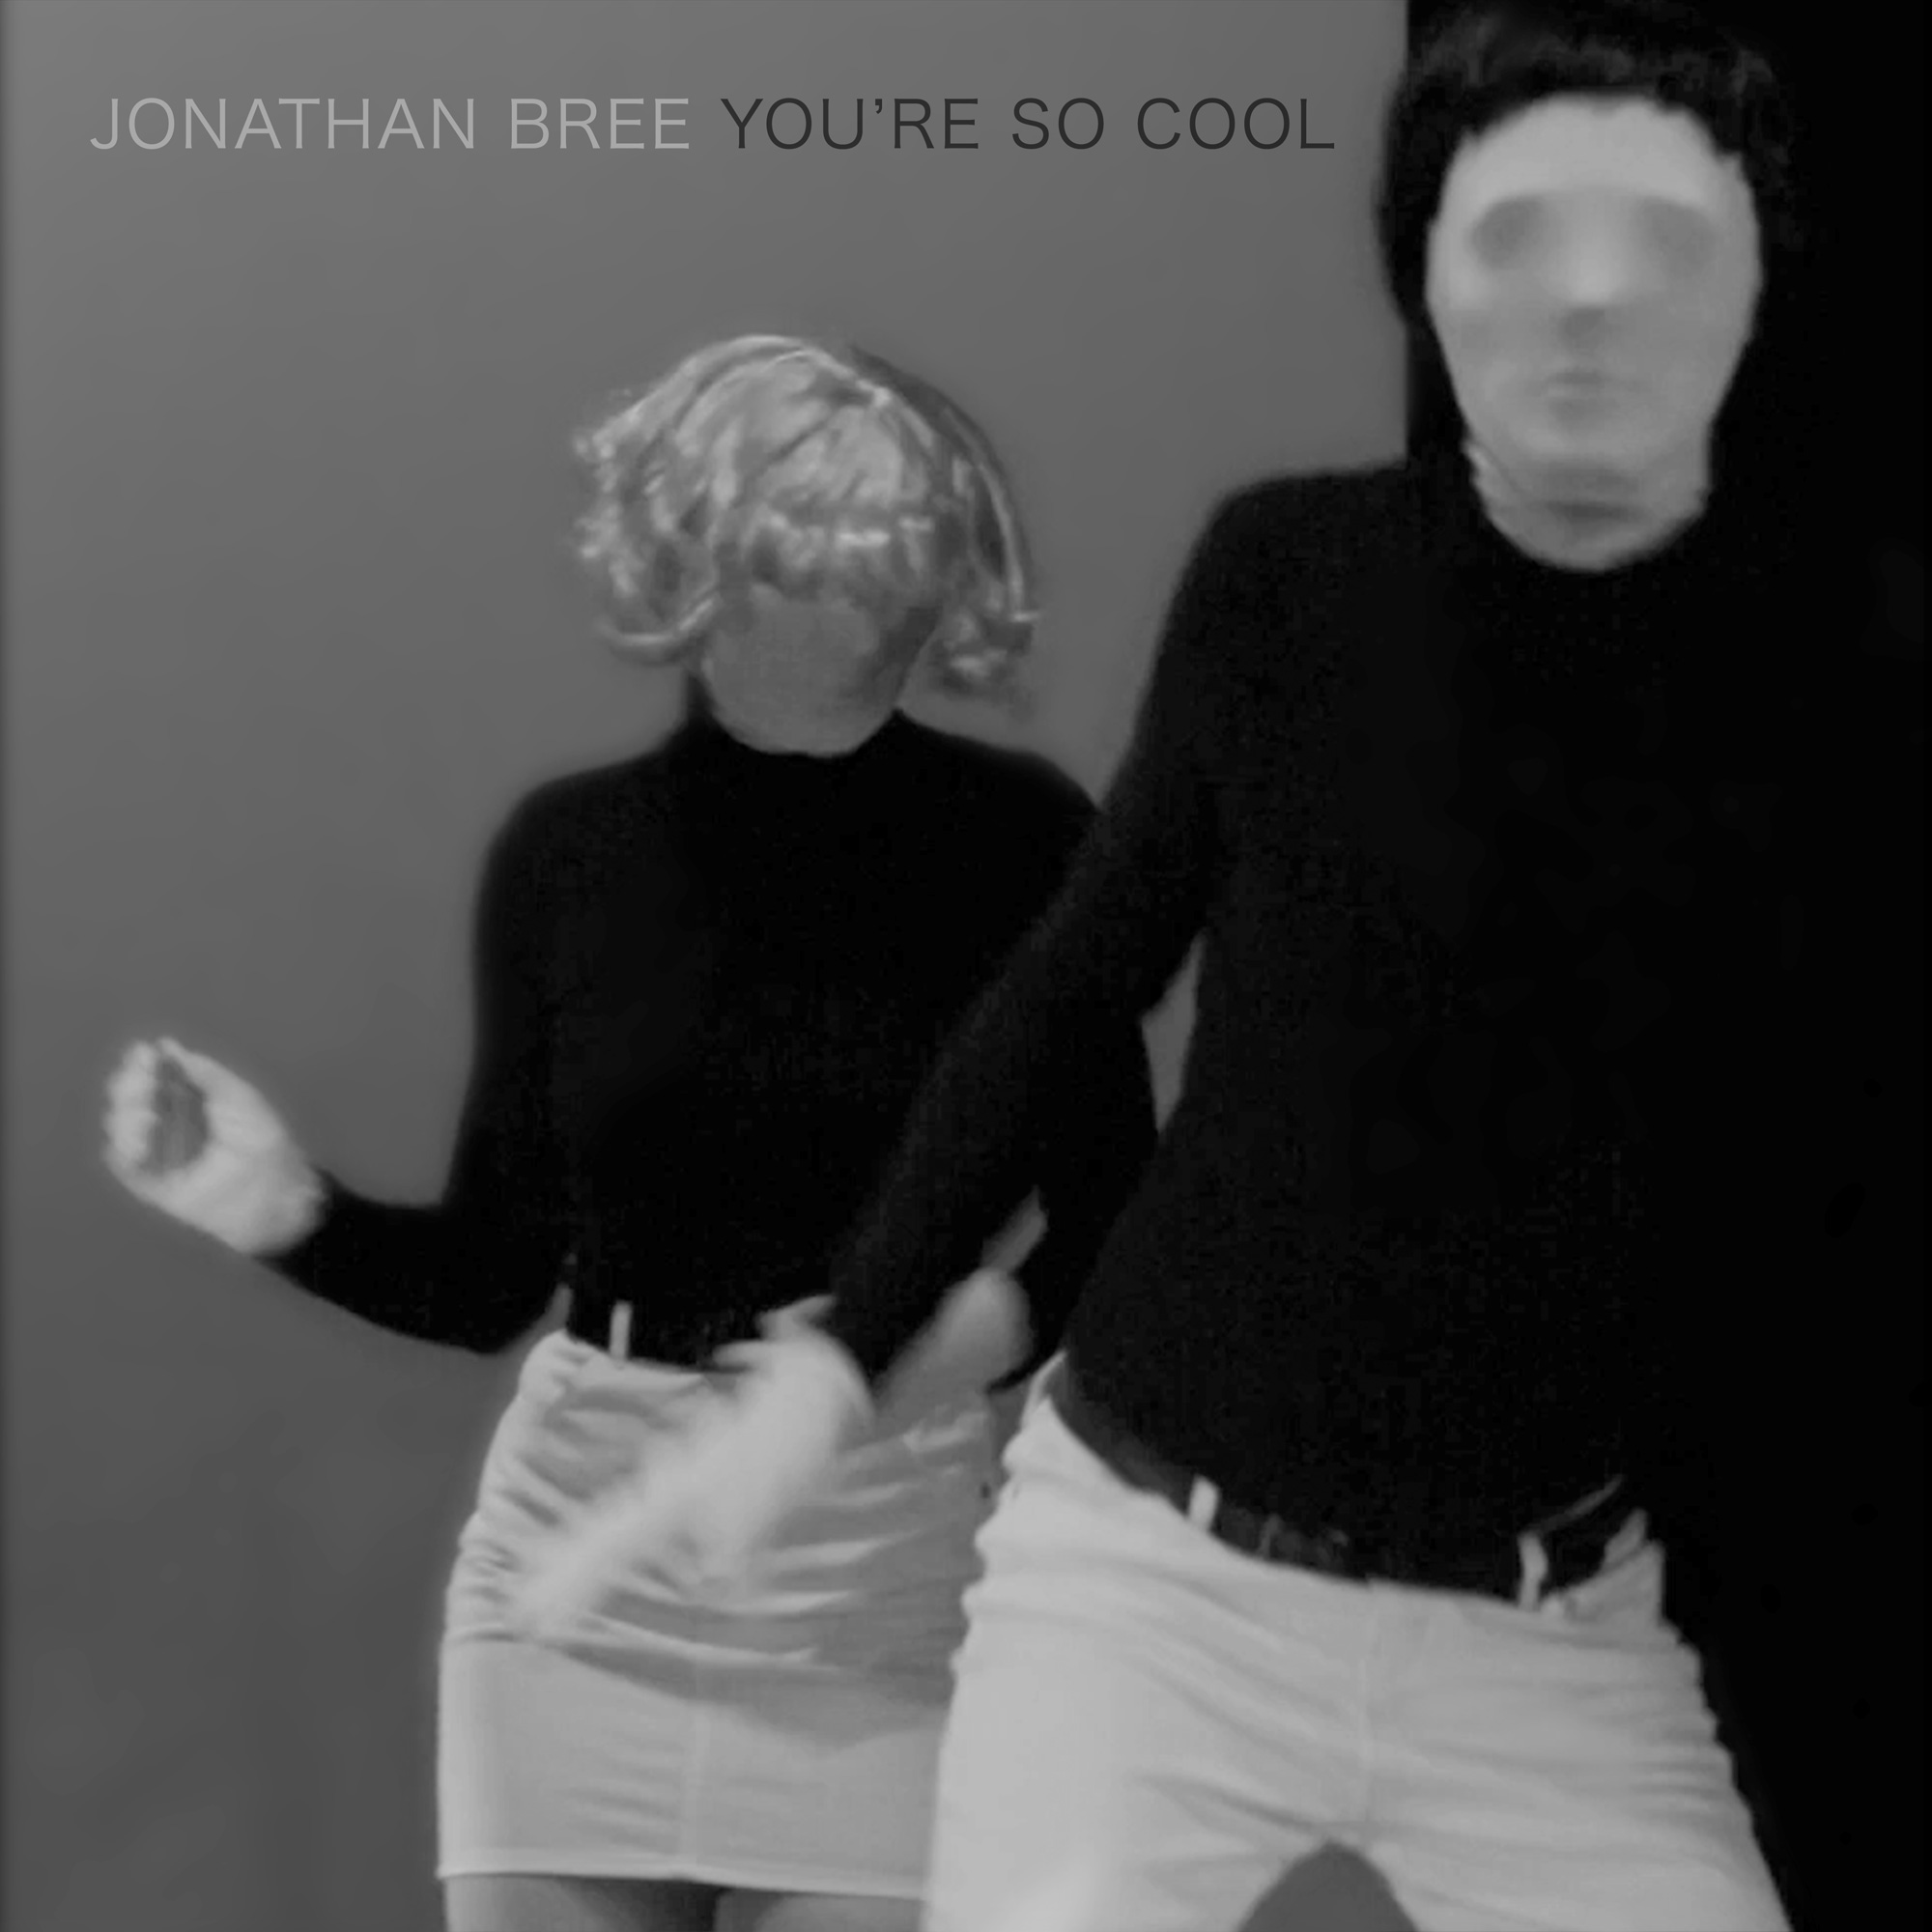 Jonathan Bree - You're So Cool/Say You Love Me Too